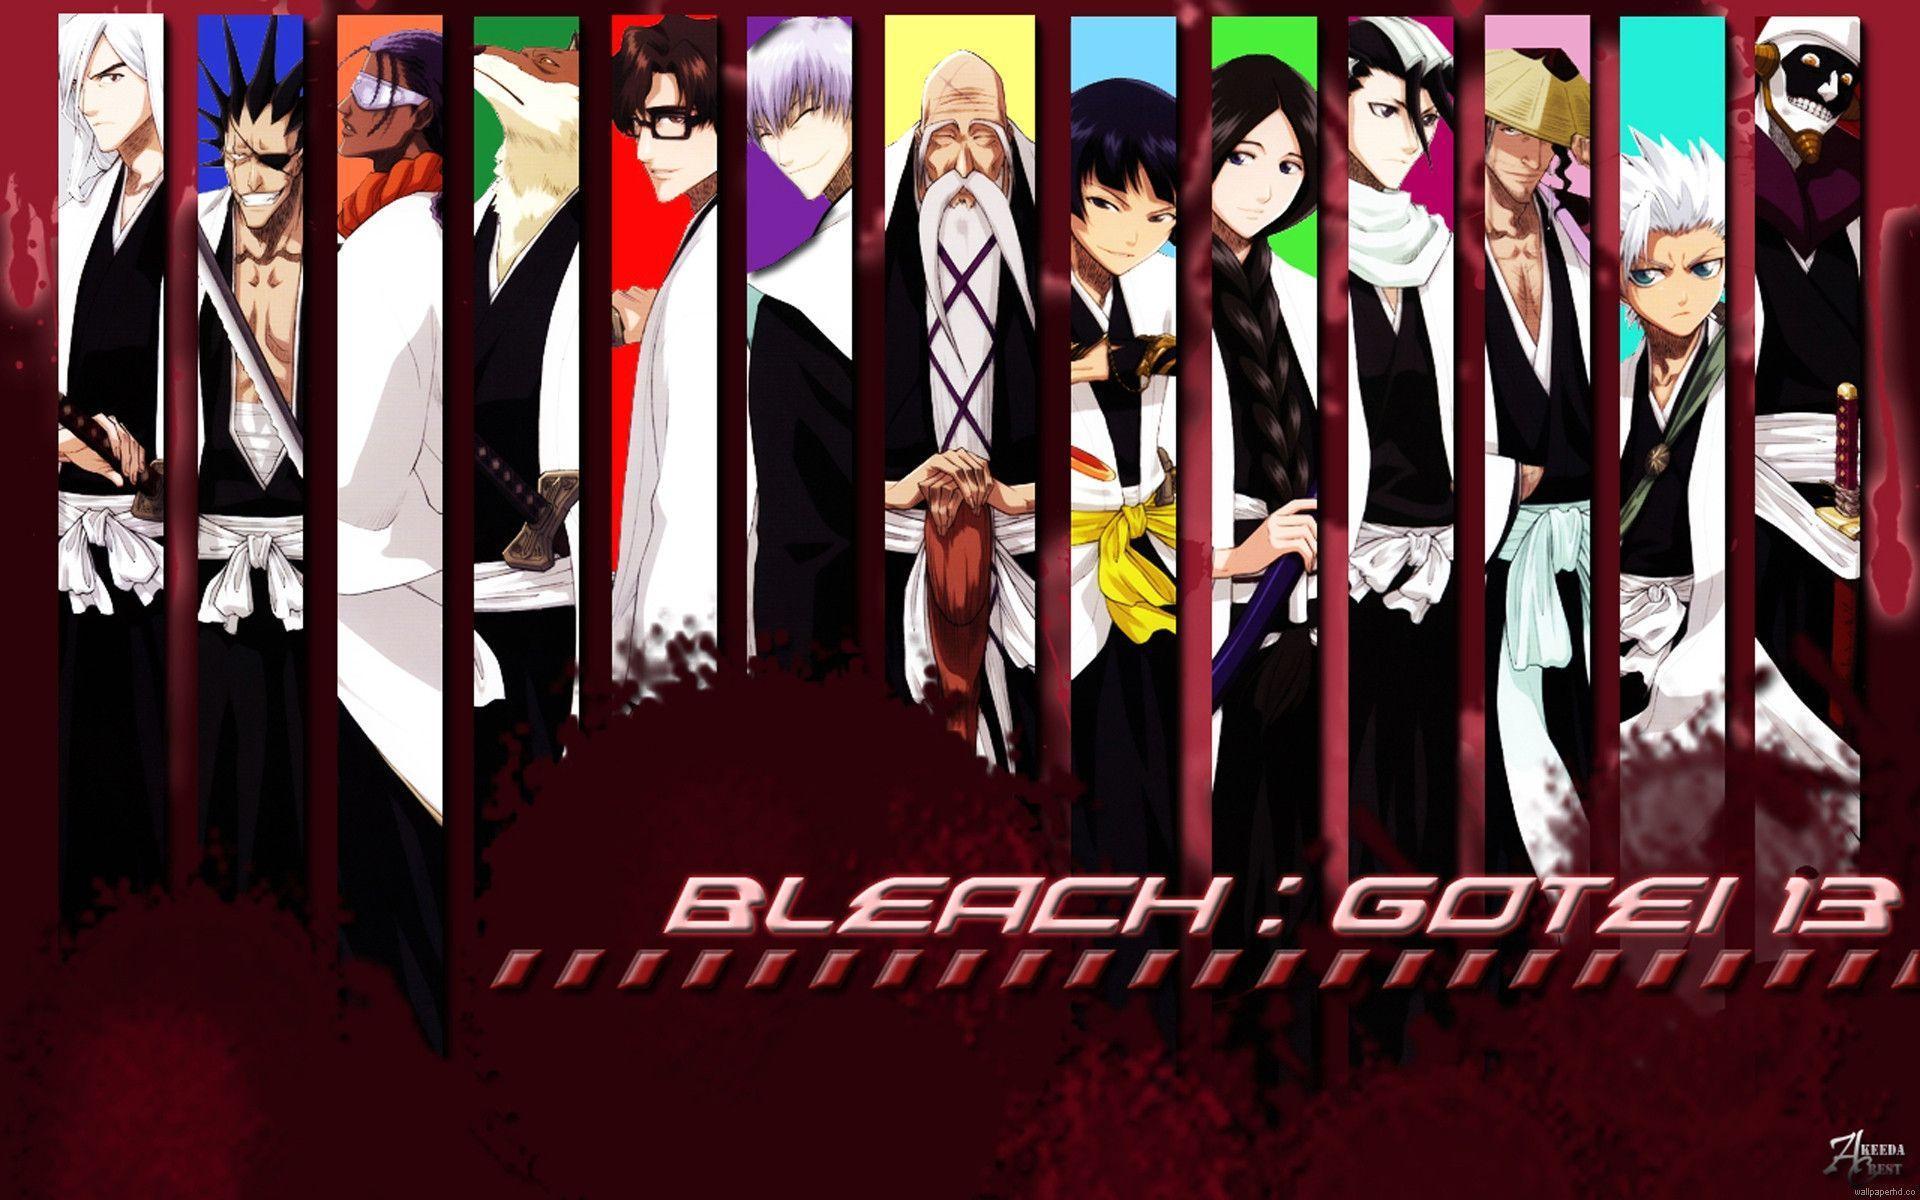 Anime Bleach Gotel Wallpaper